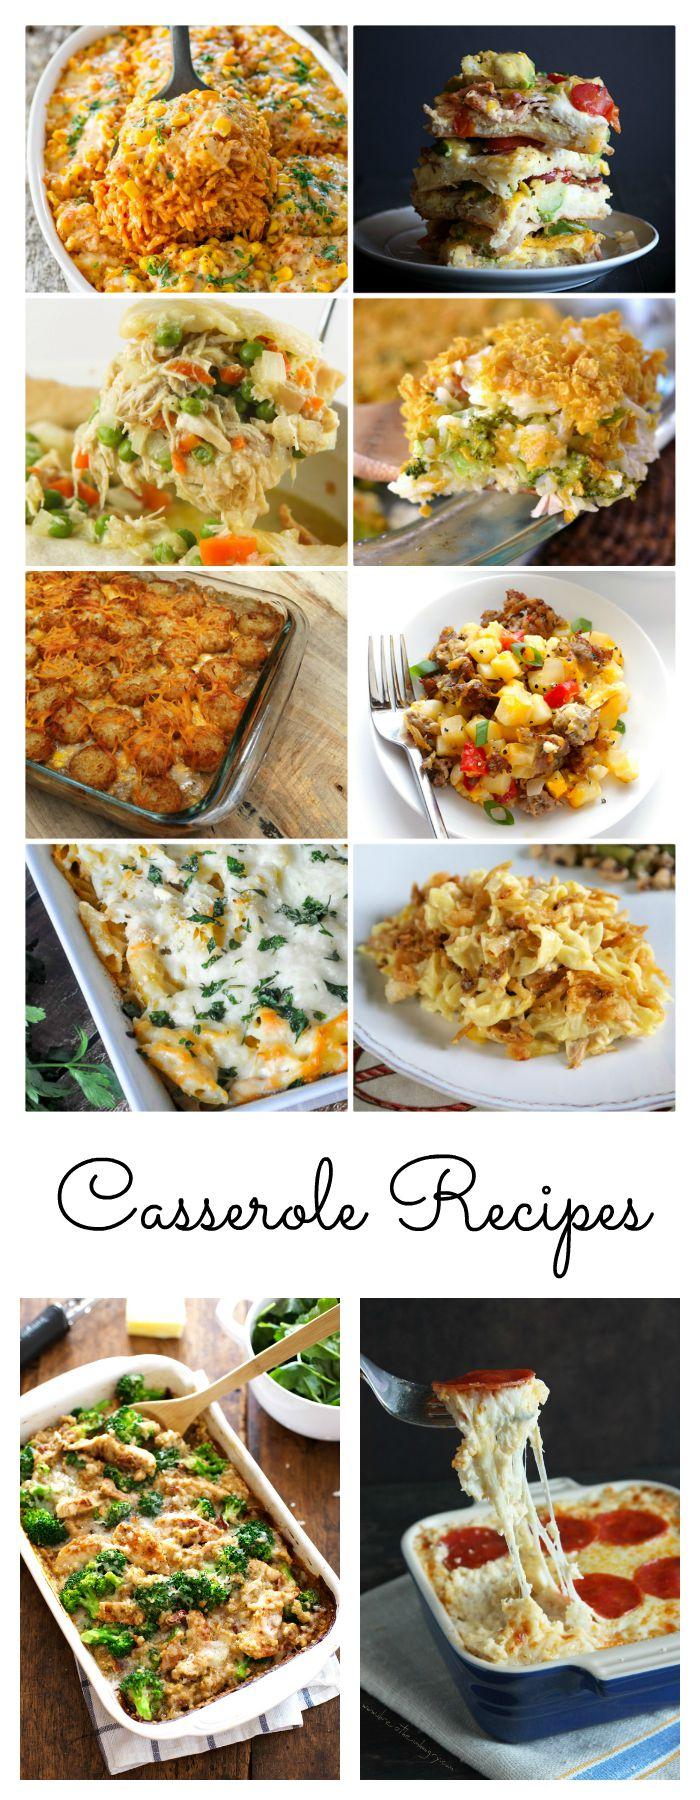 Casserole-Recipes-Weeknight-Dinner-Ideas